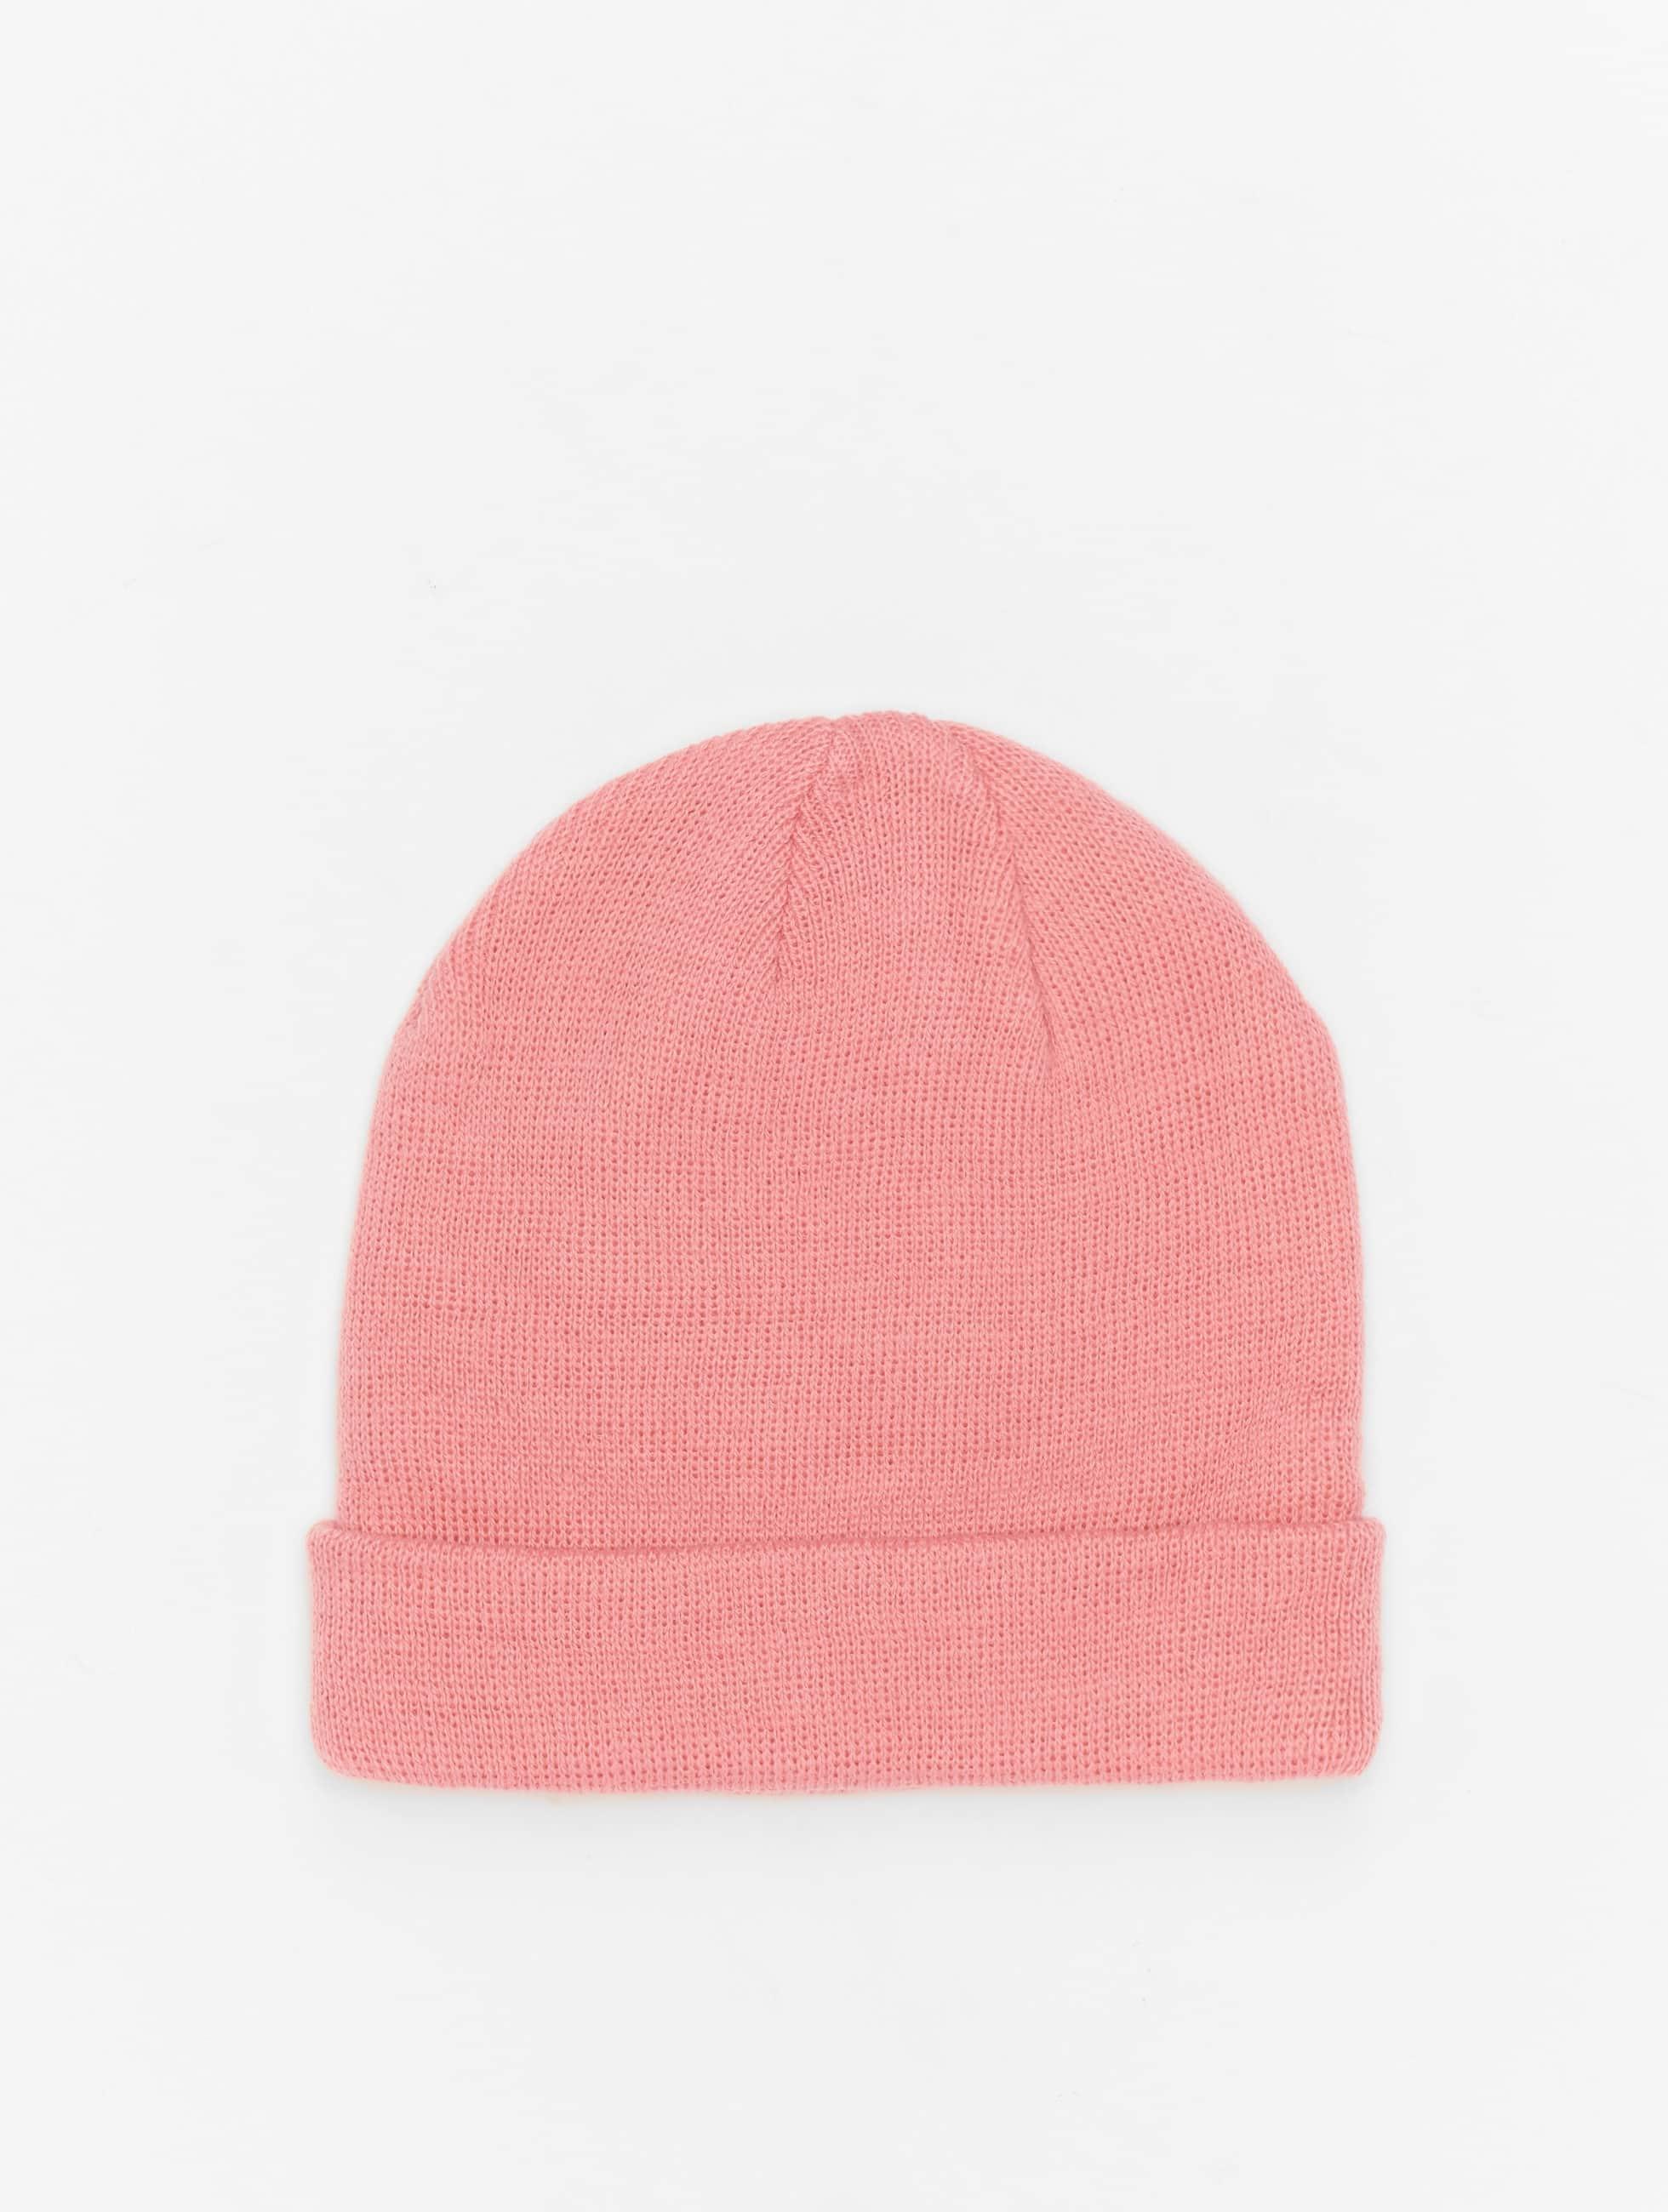 MSTRDS шляпа Short Pastel Cuff Knit лаванда